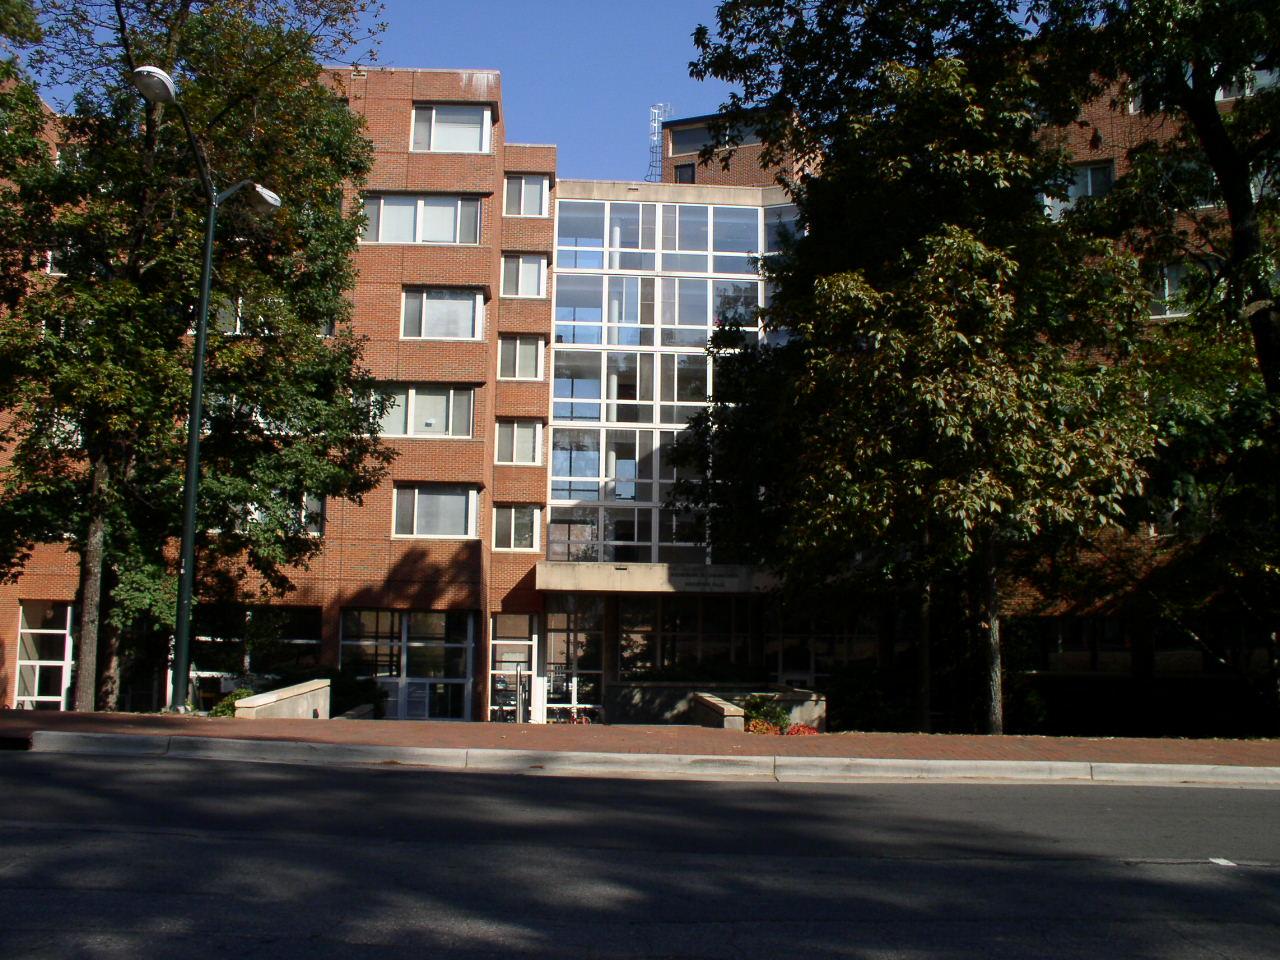 Historical Photo of Carmichael Residence Hall